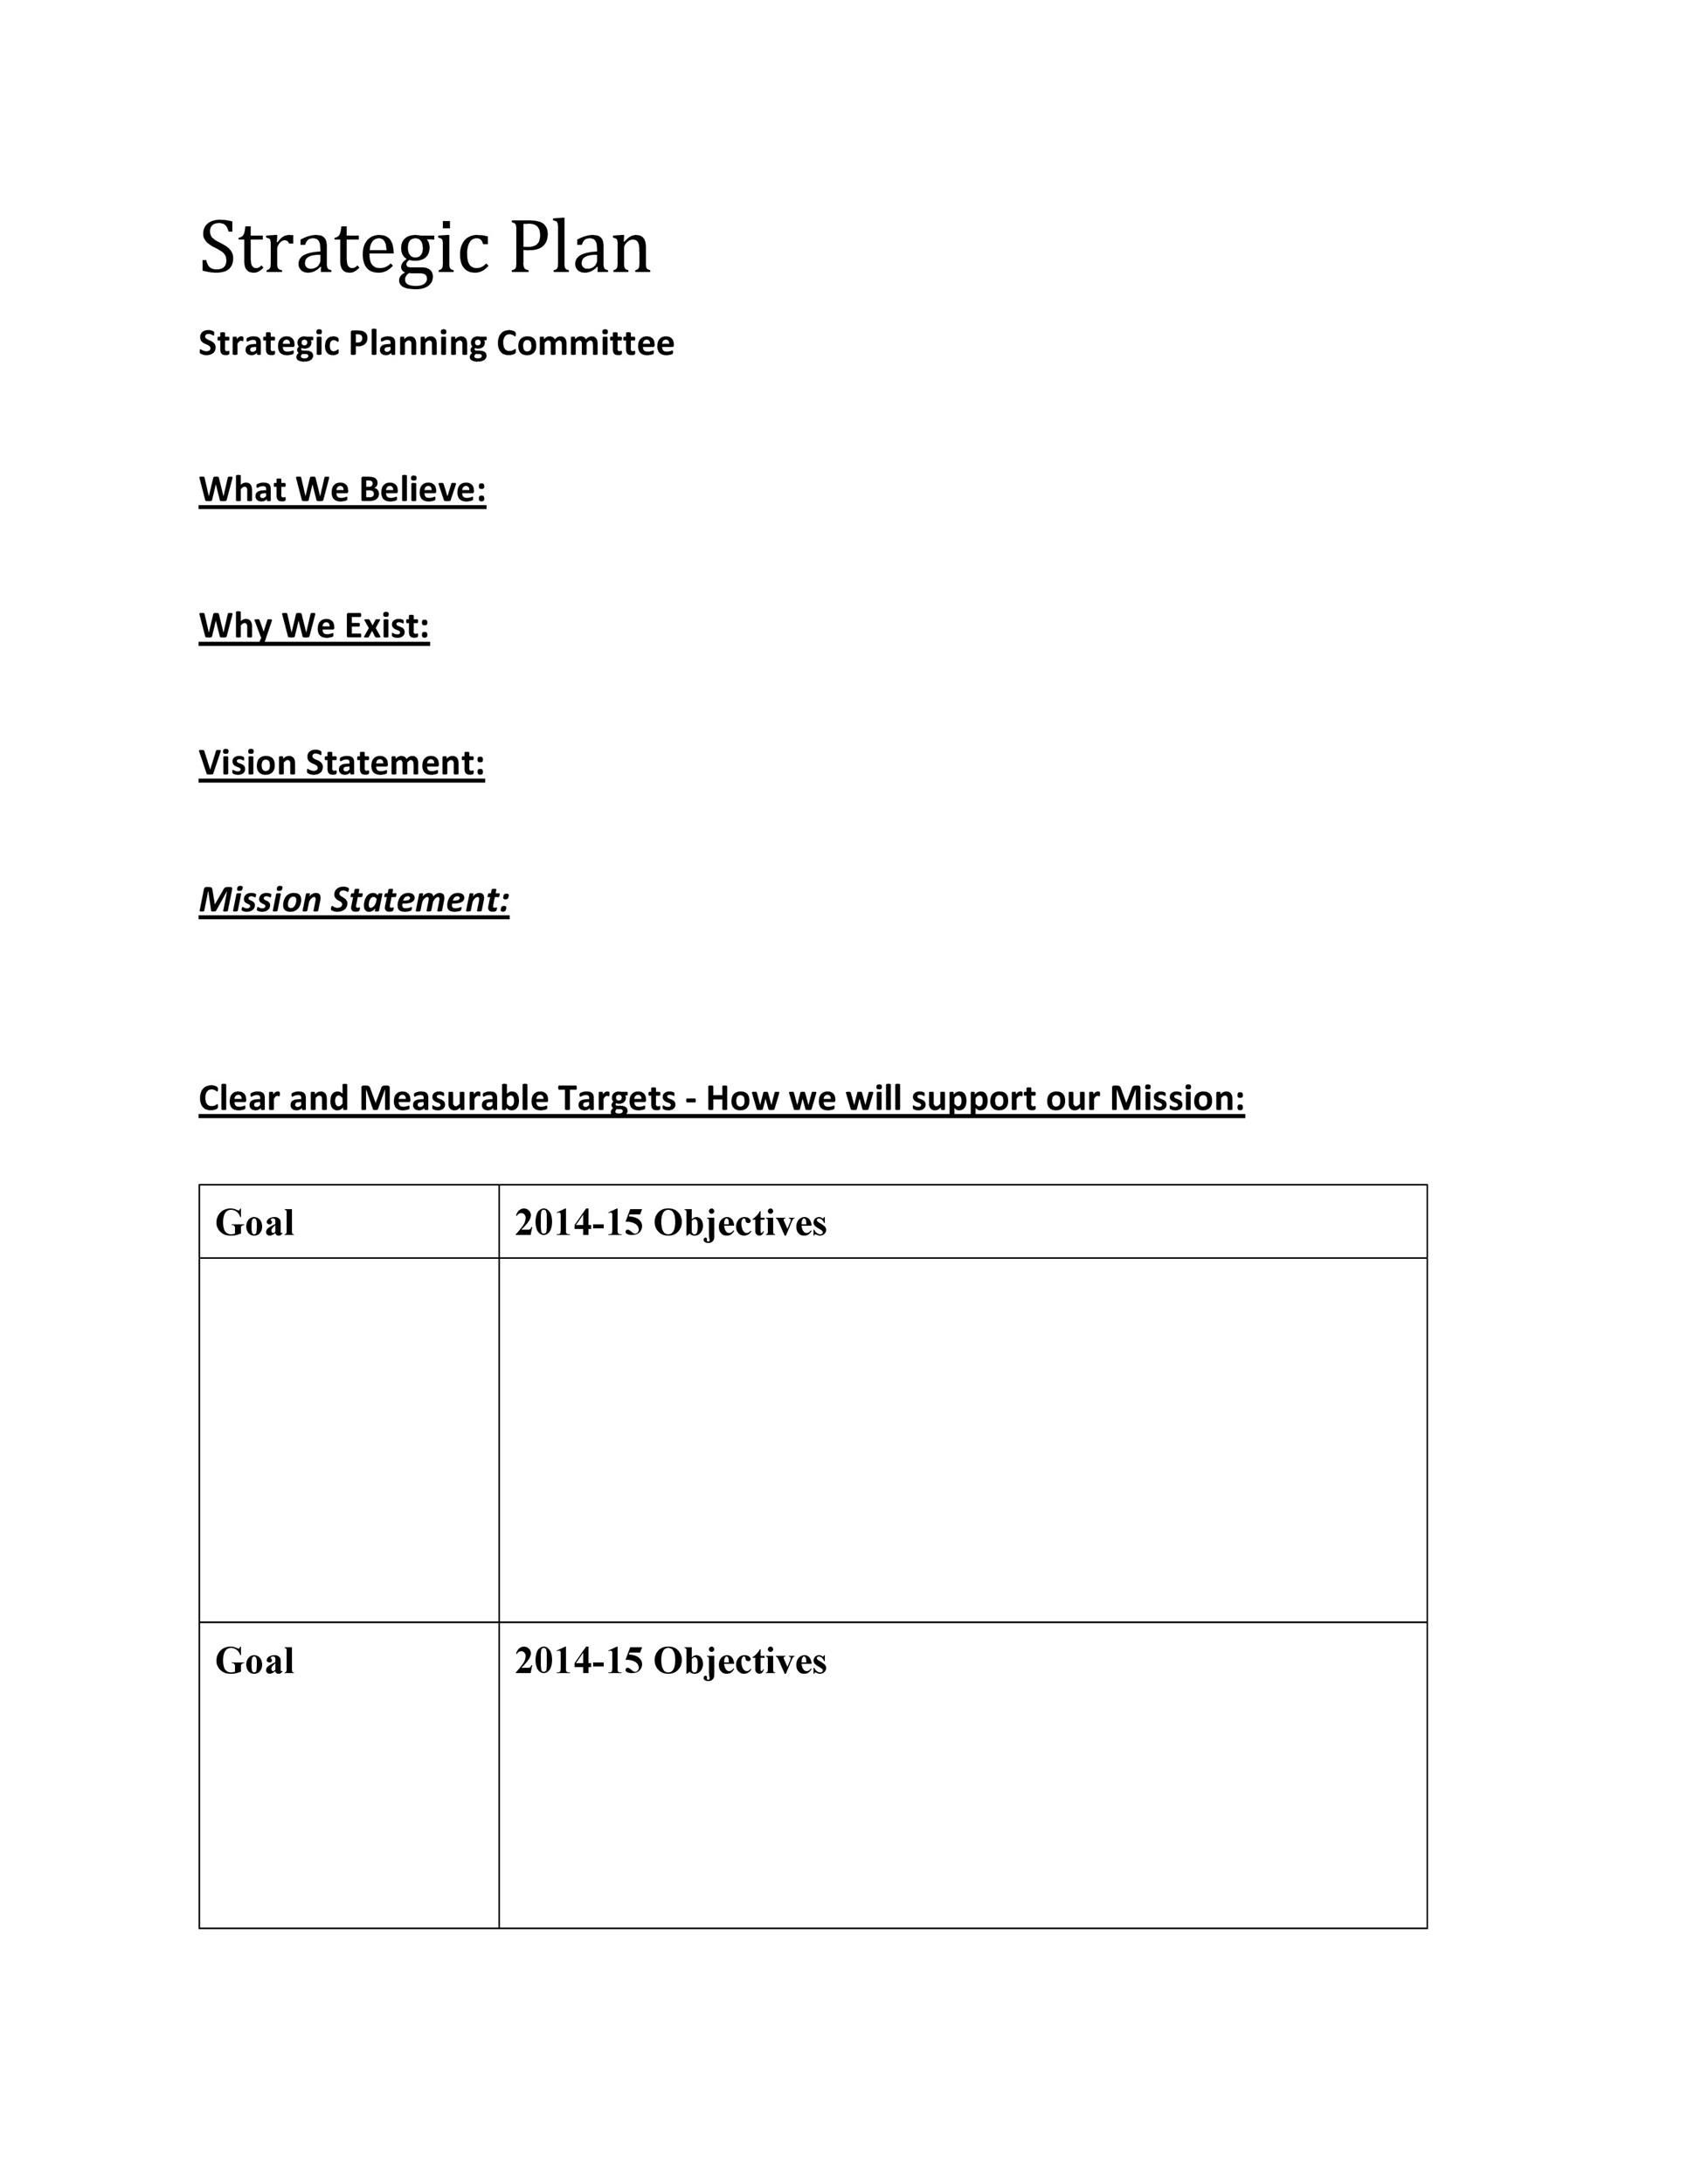 009 Shocking Strategic Plan Outline Template Photo  MarketingFull